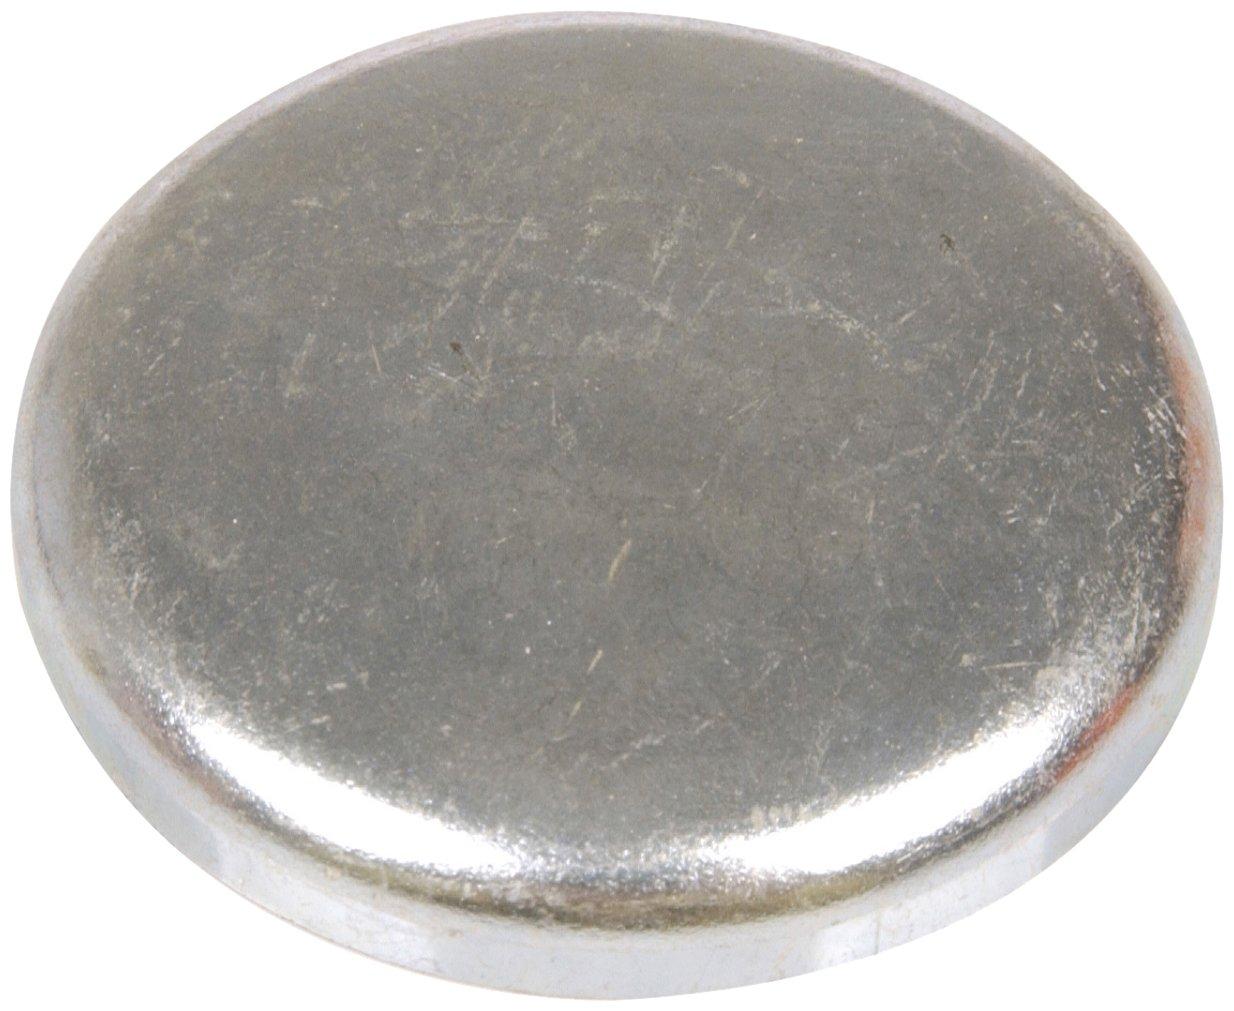 Dorman 555-077 1 1/2 Cup Expansion Plugs, Pack of 10 Dorman - Autograde